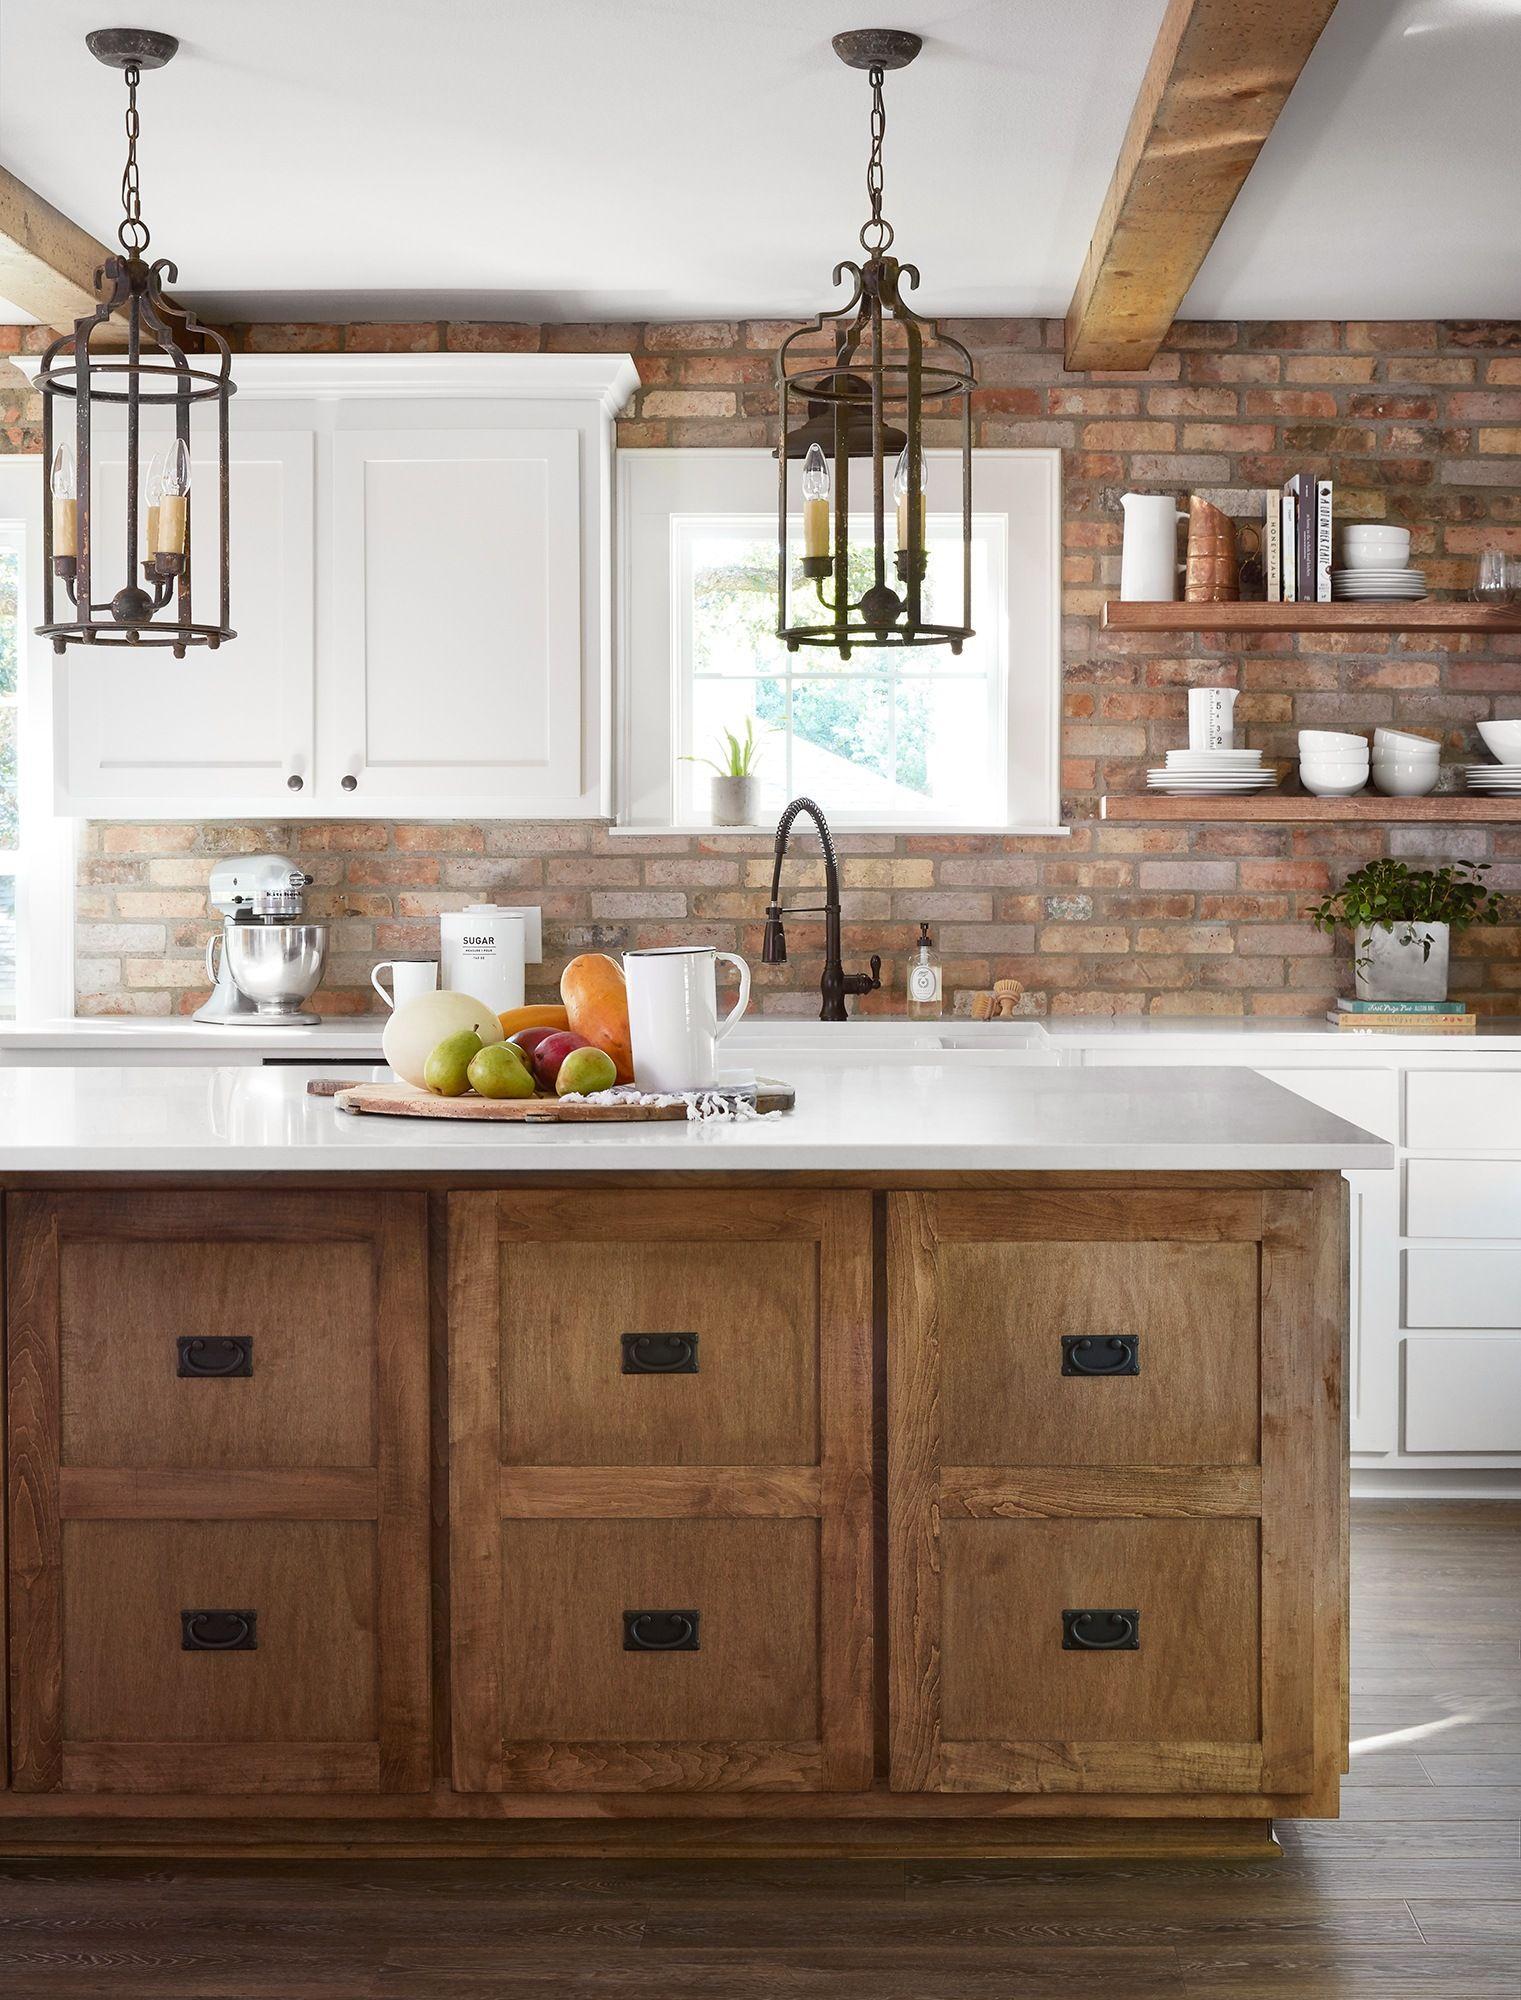 Season 5 fixer upper episode 3 reveal fixer upper for Joanna gaines style kitchen